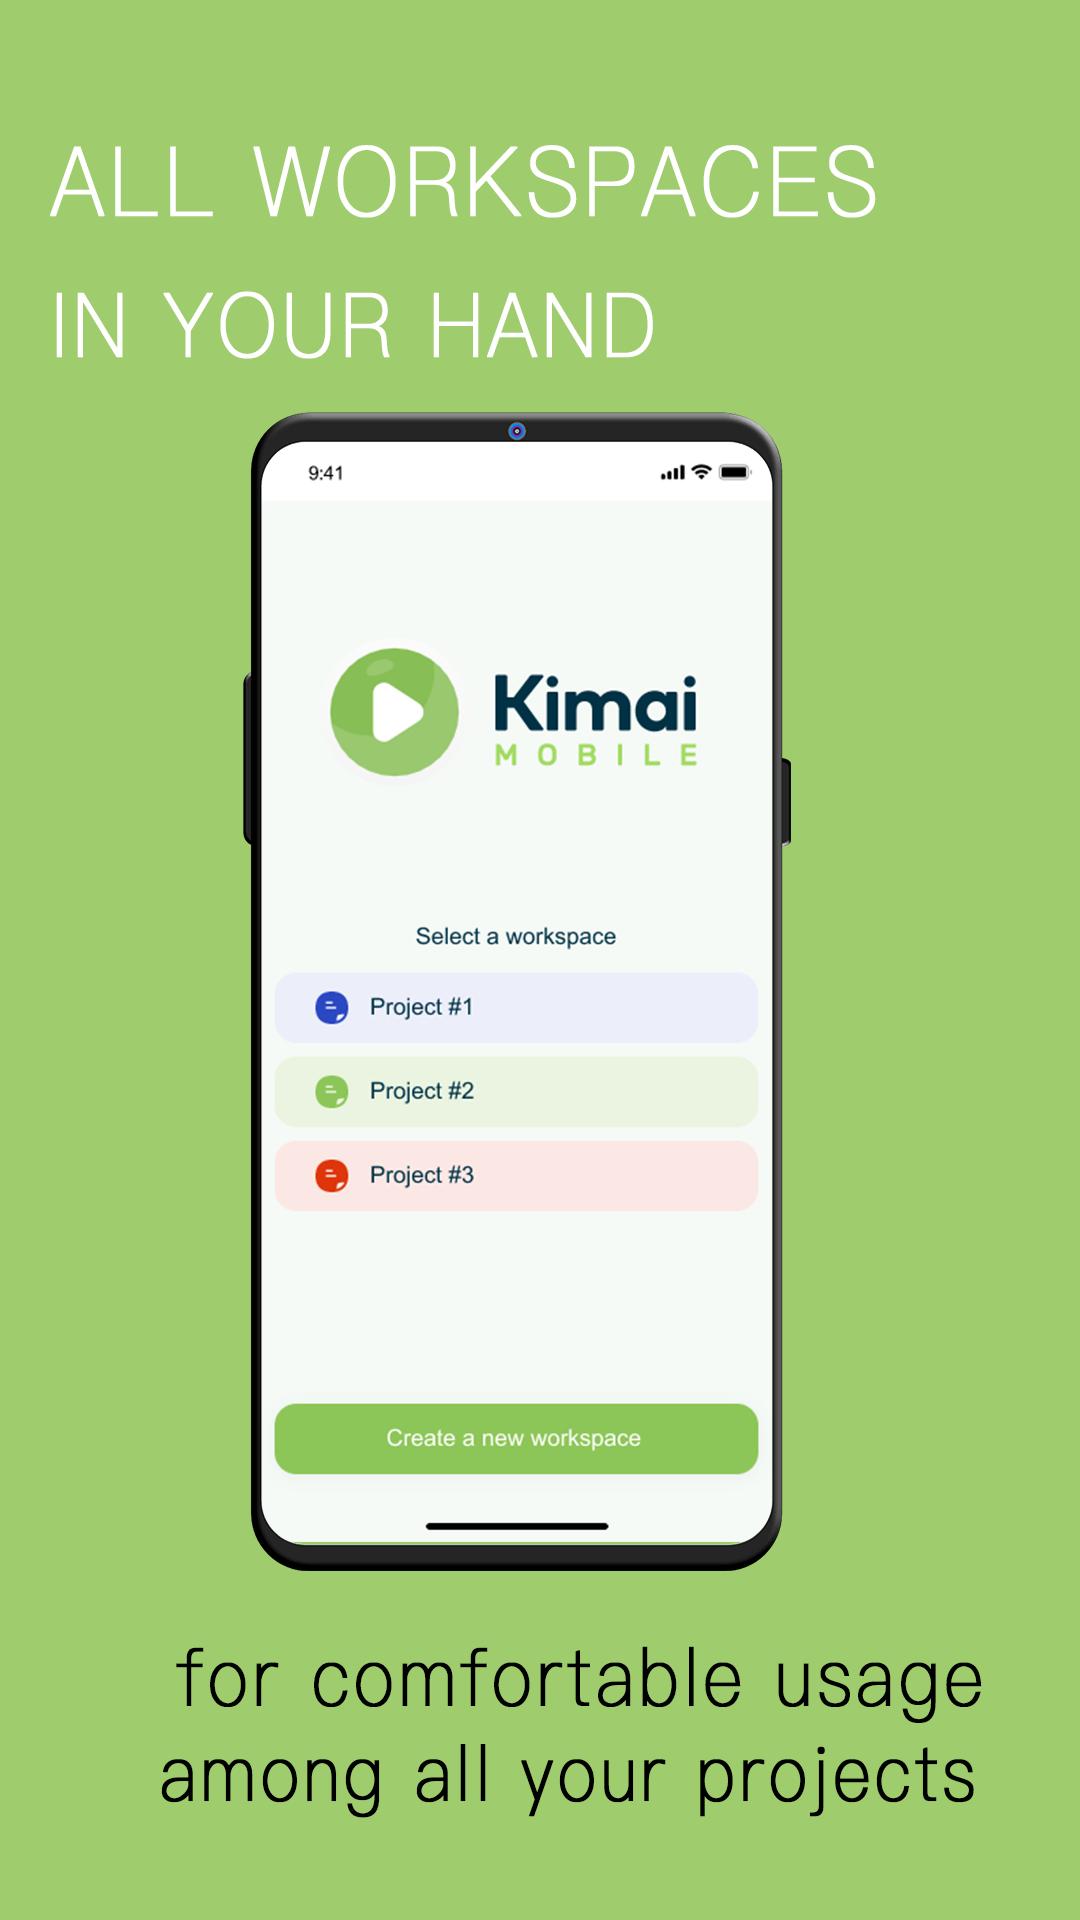 Kimai Mobile